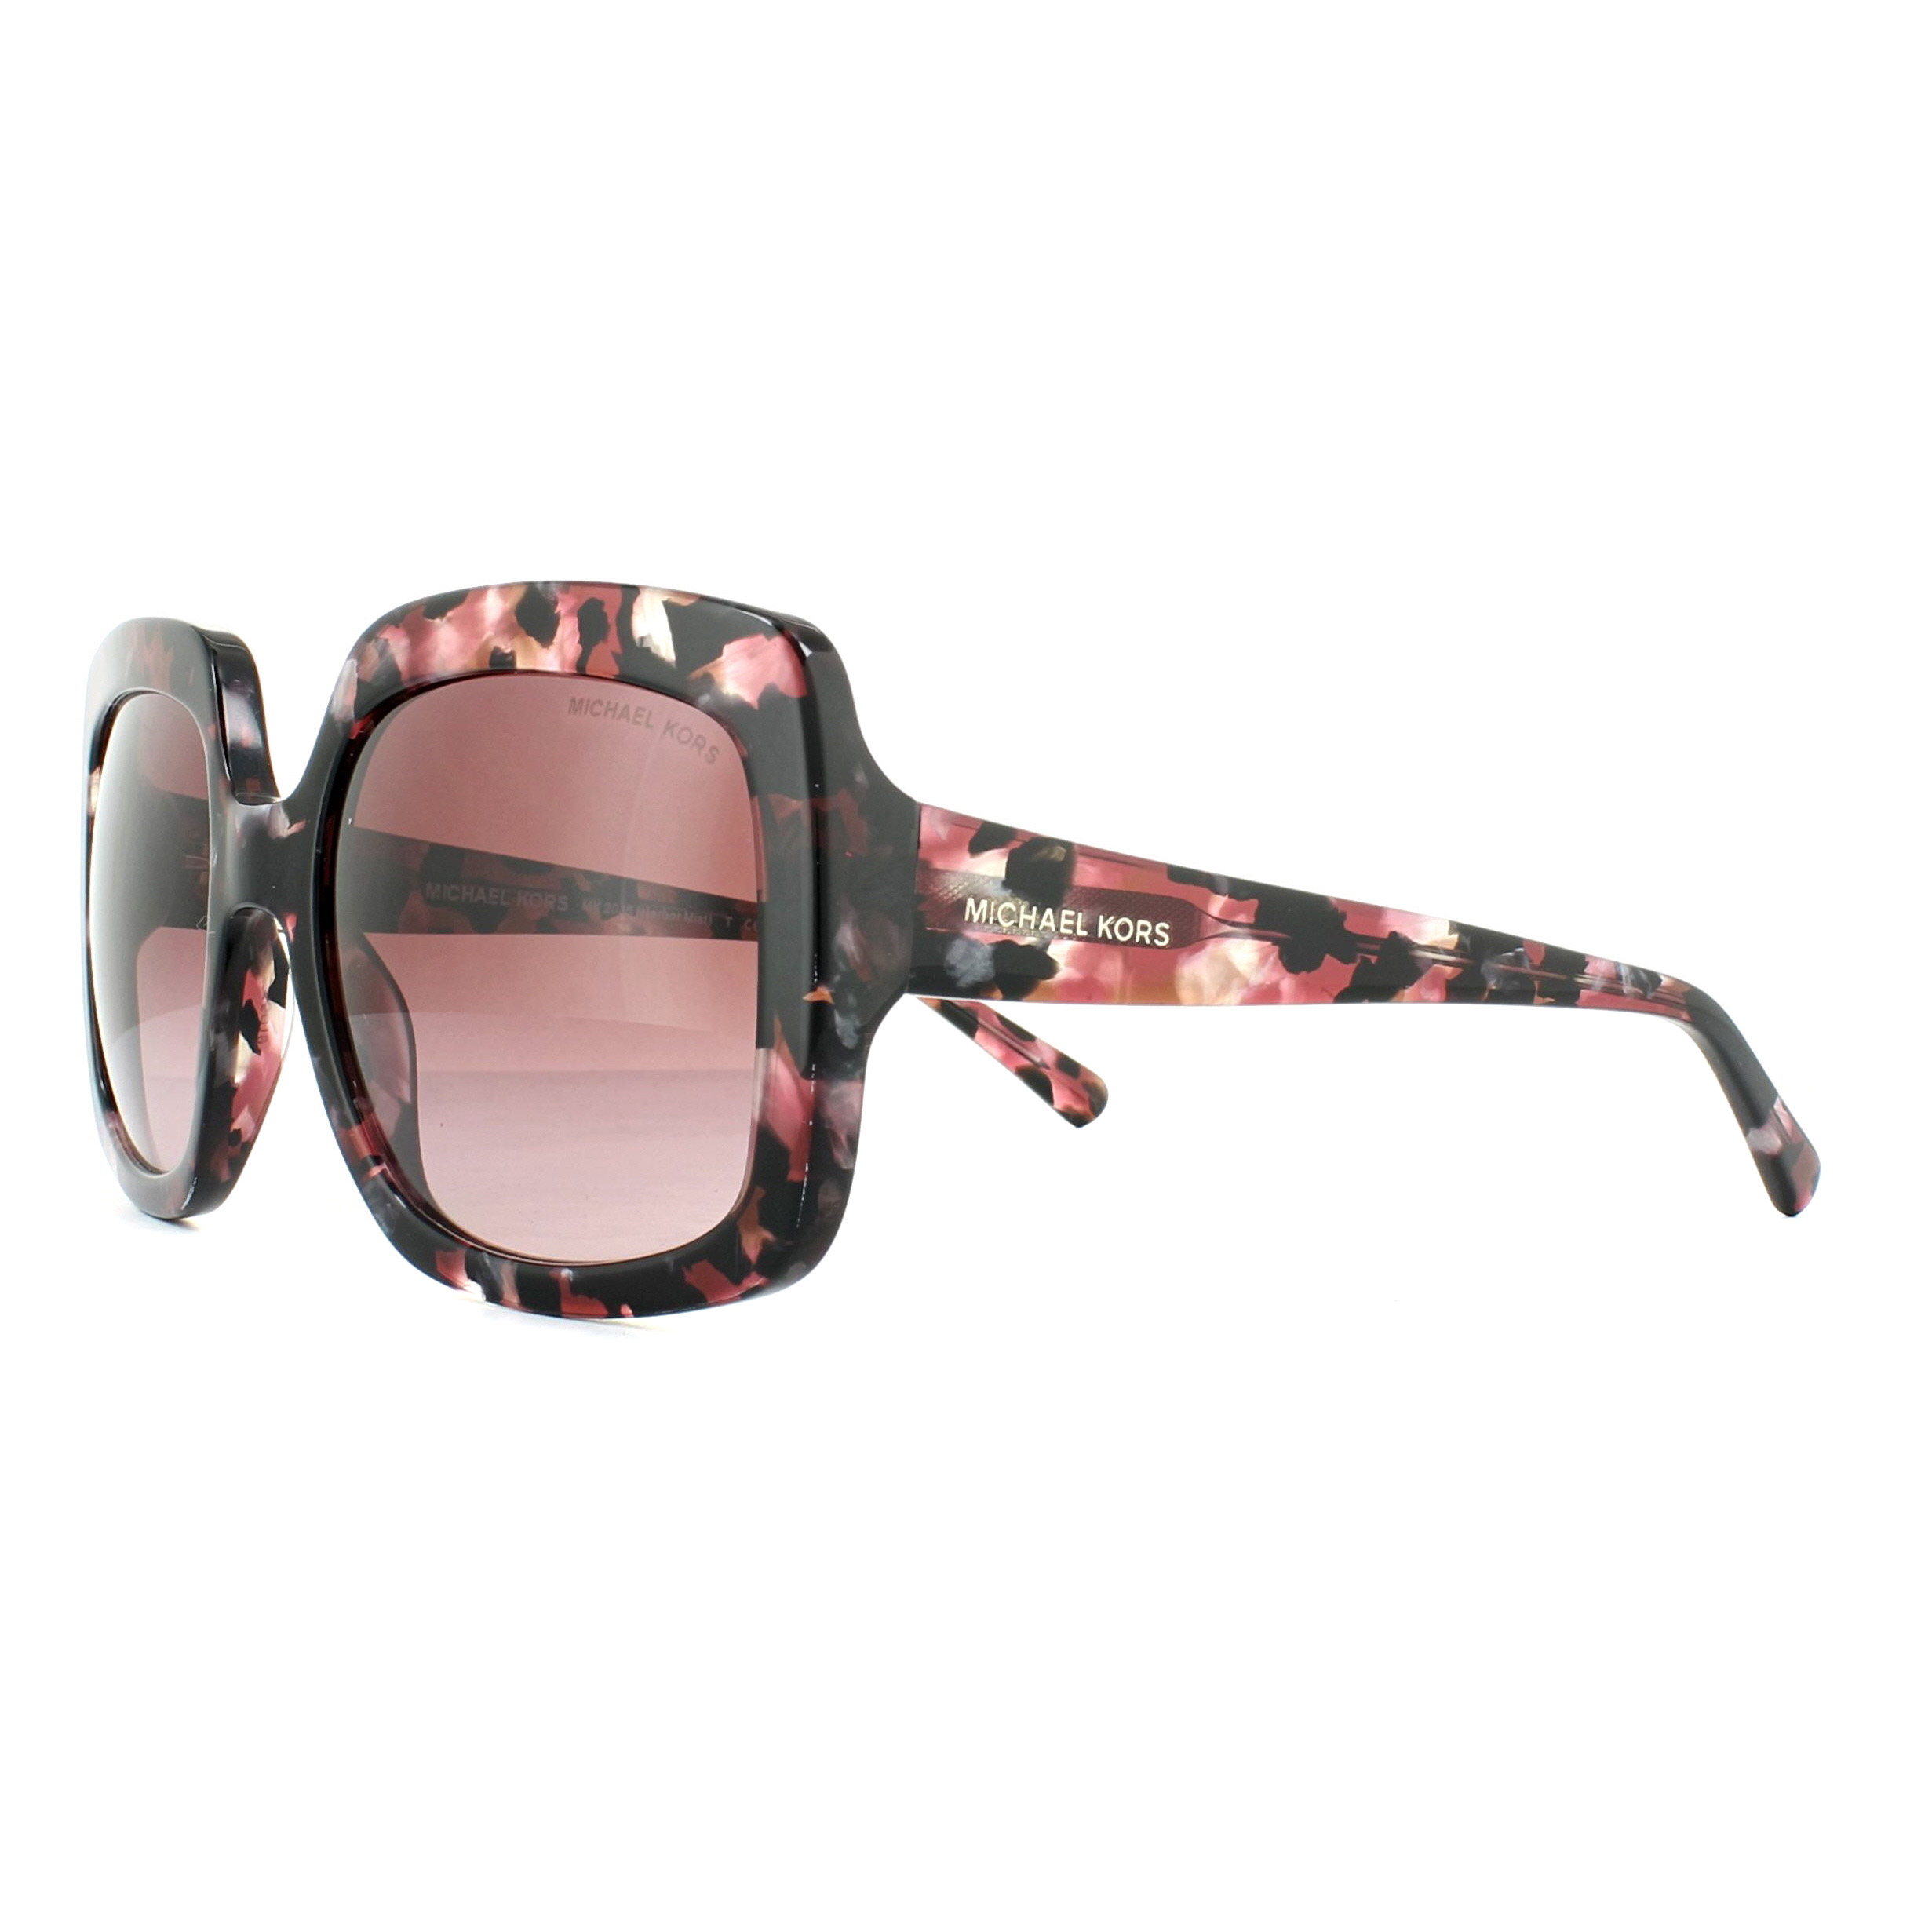 b13163a032 Michael Kors Sunglasses Harbor Mist 2036 32138H Merlot Mosaic ...